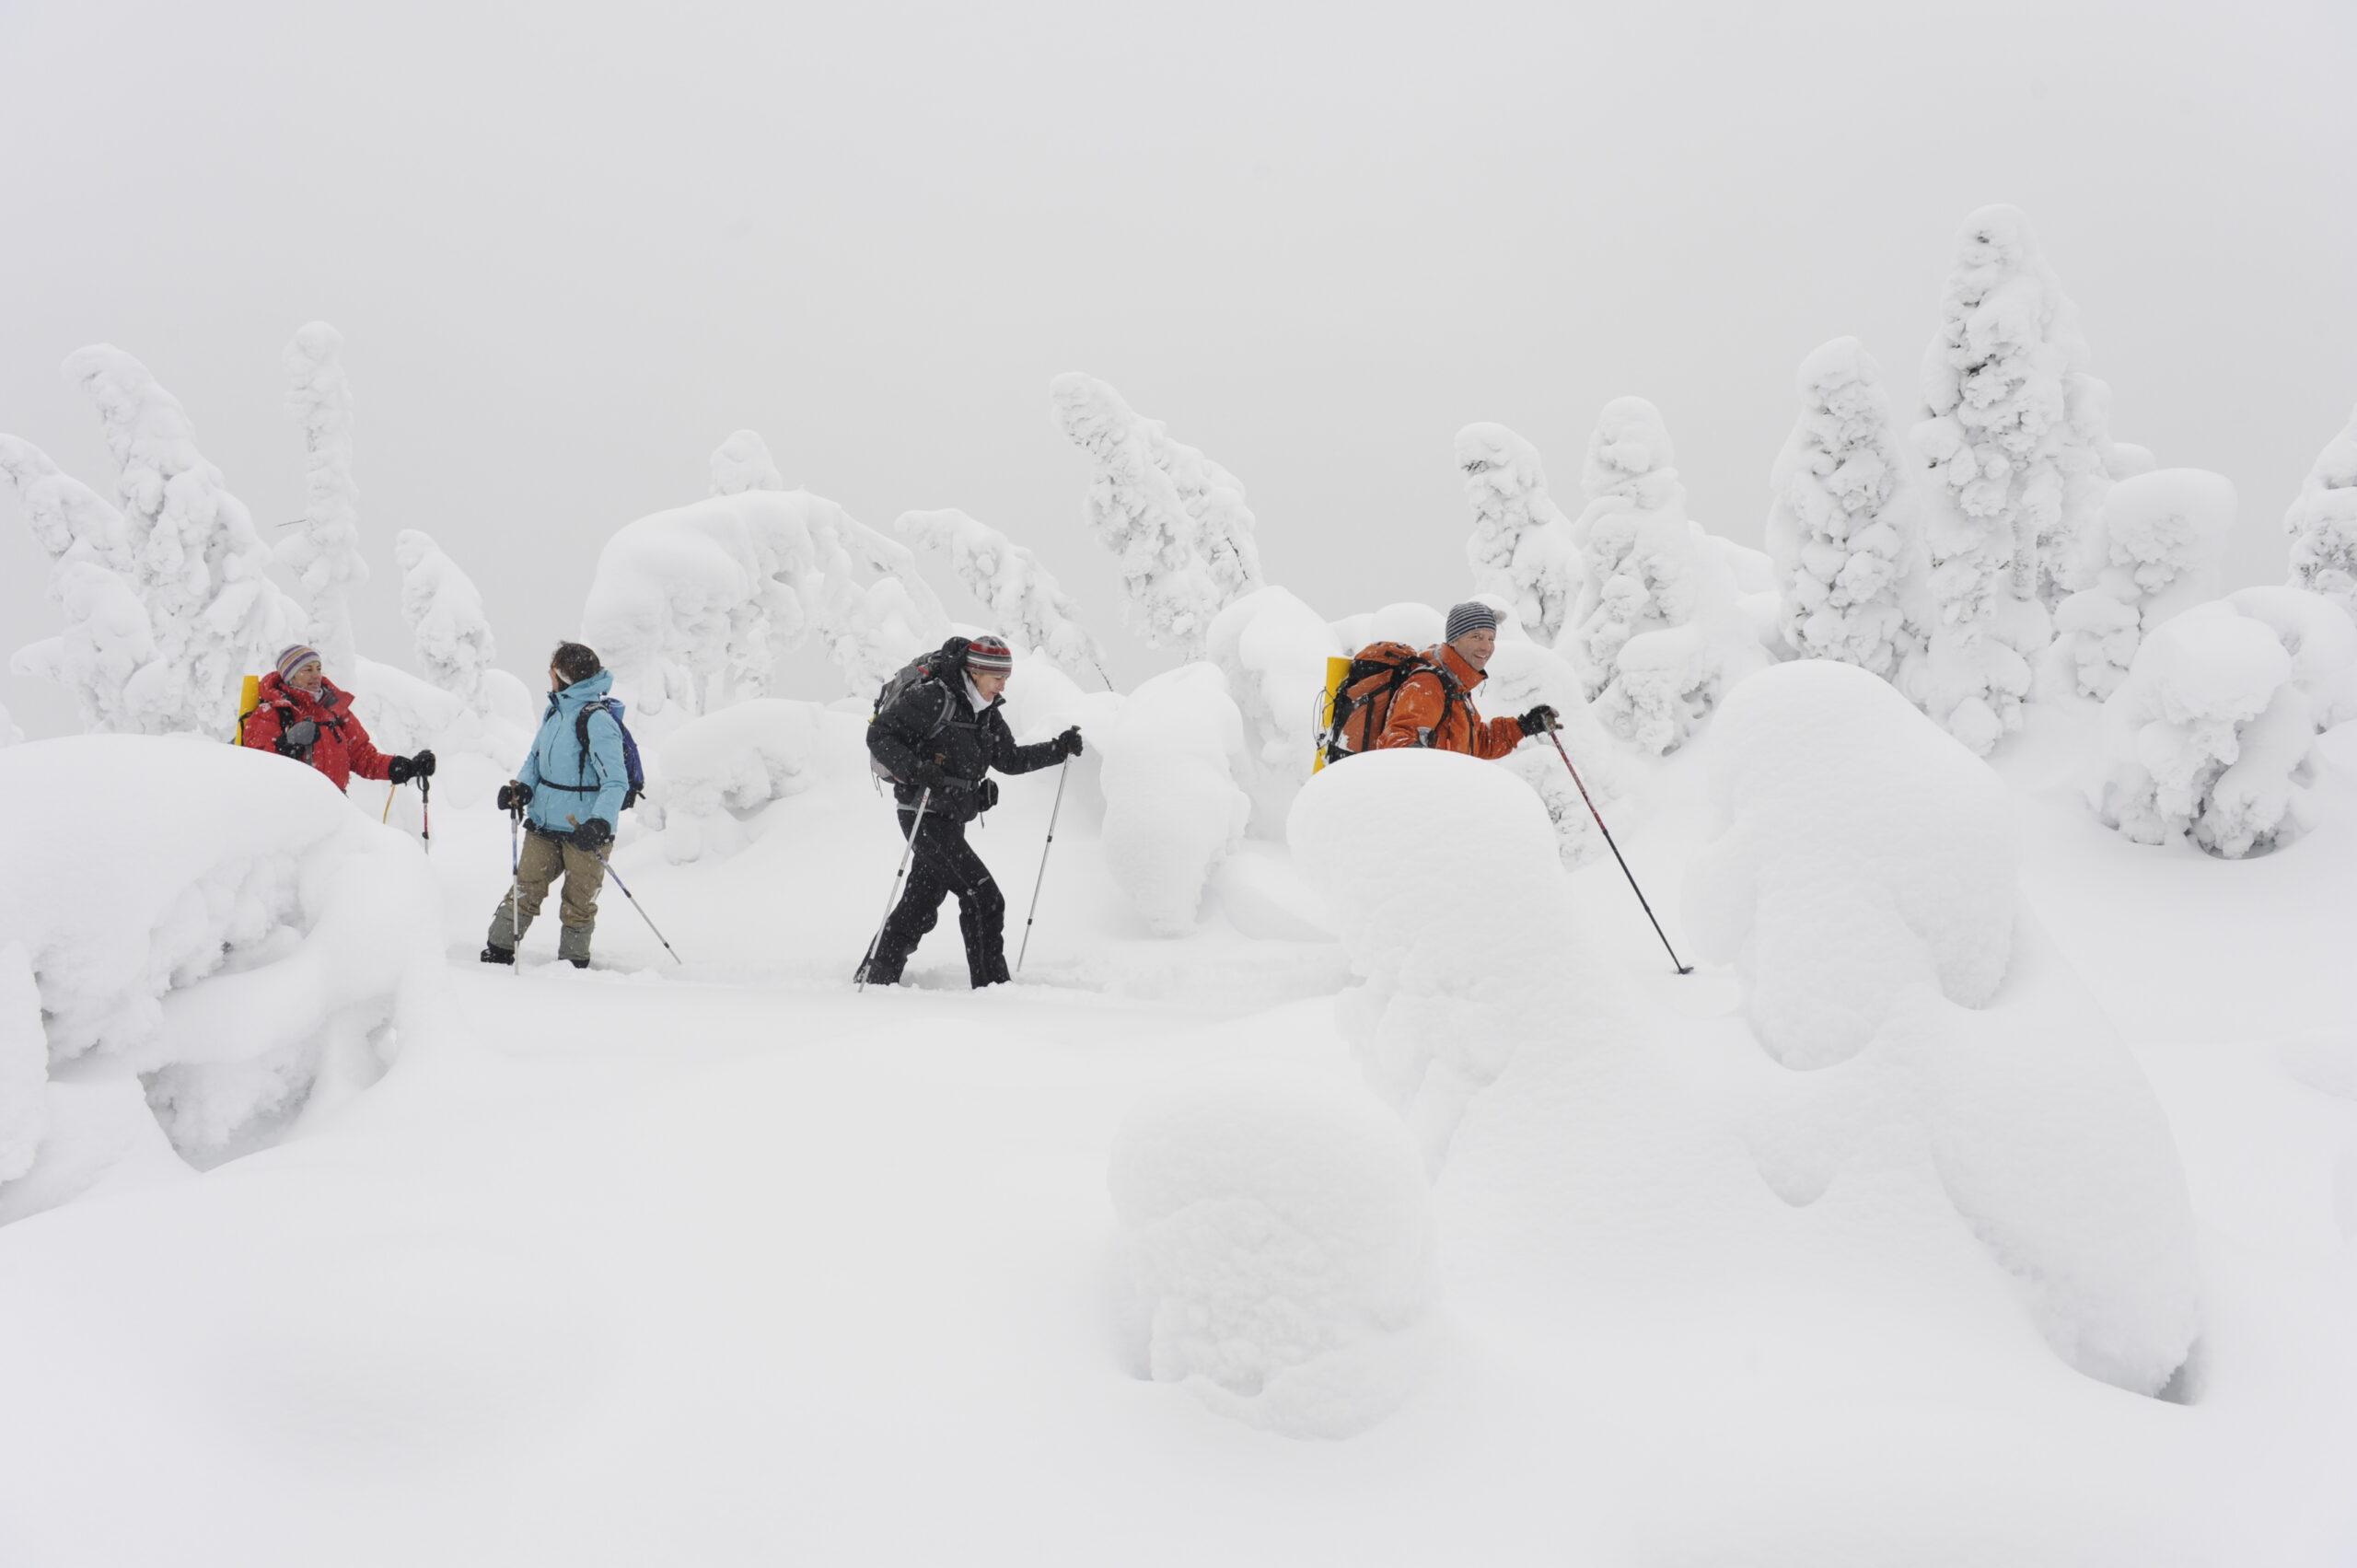 Winter Sports in Canada - Gaspésie National Park